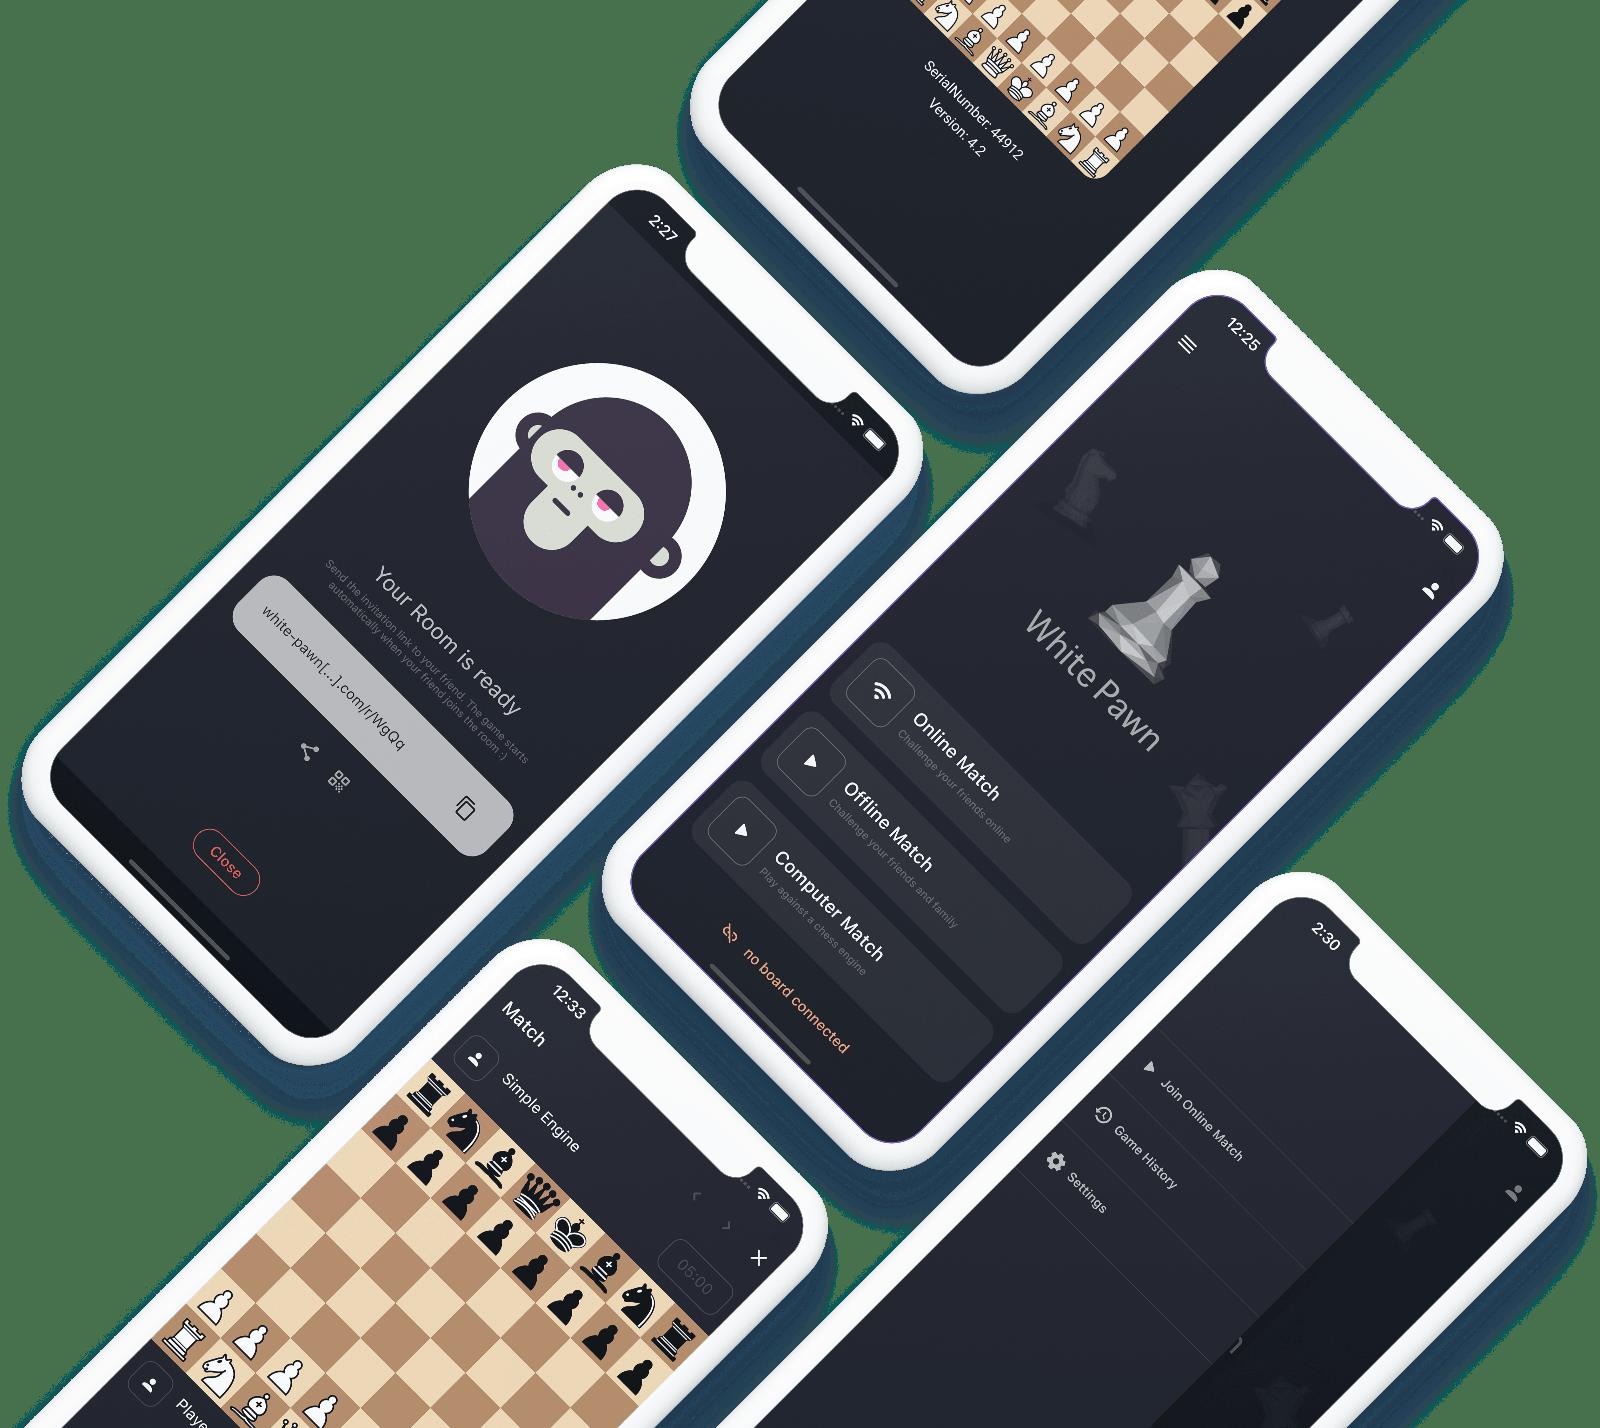 WhitePawn DGT App